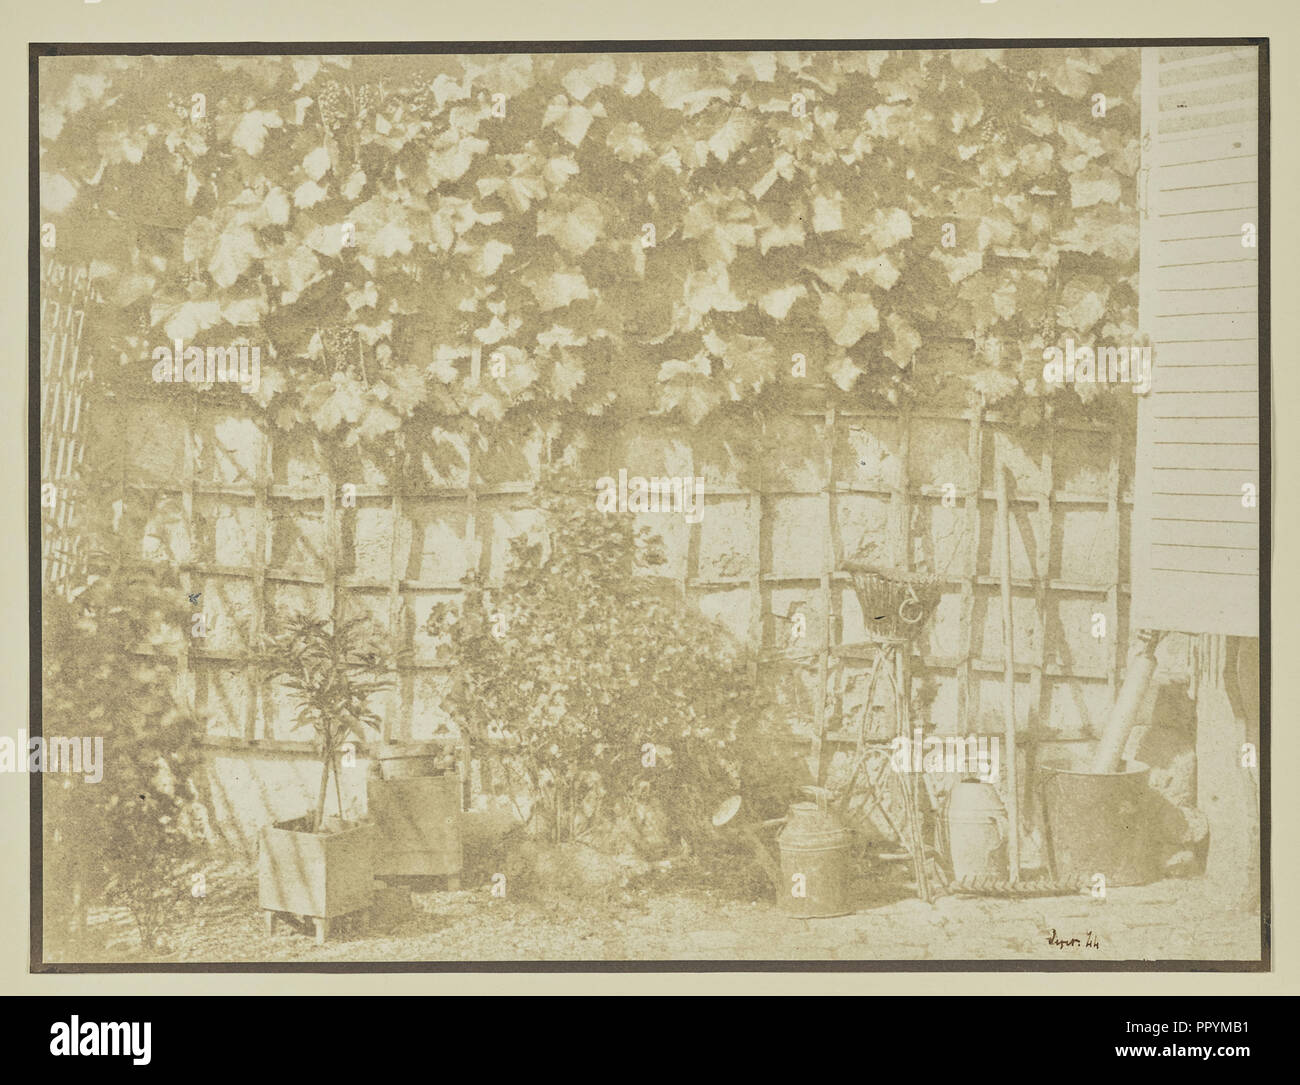 Mur de jardin avec des outils ; Hippolyte Bayard, Français ...